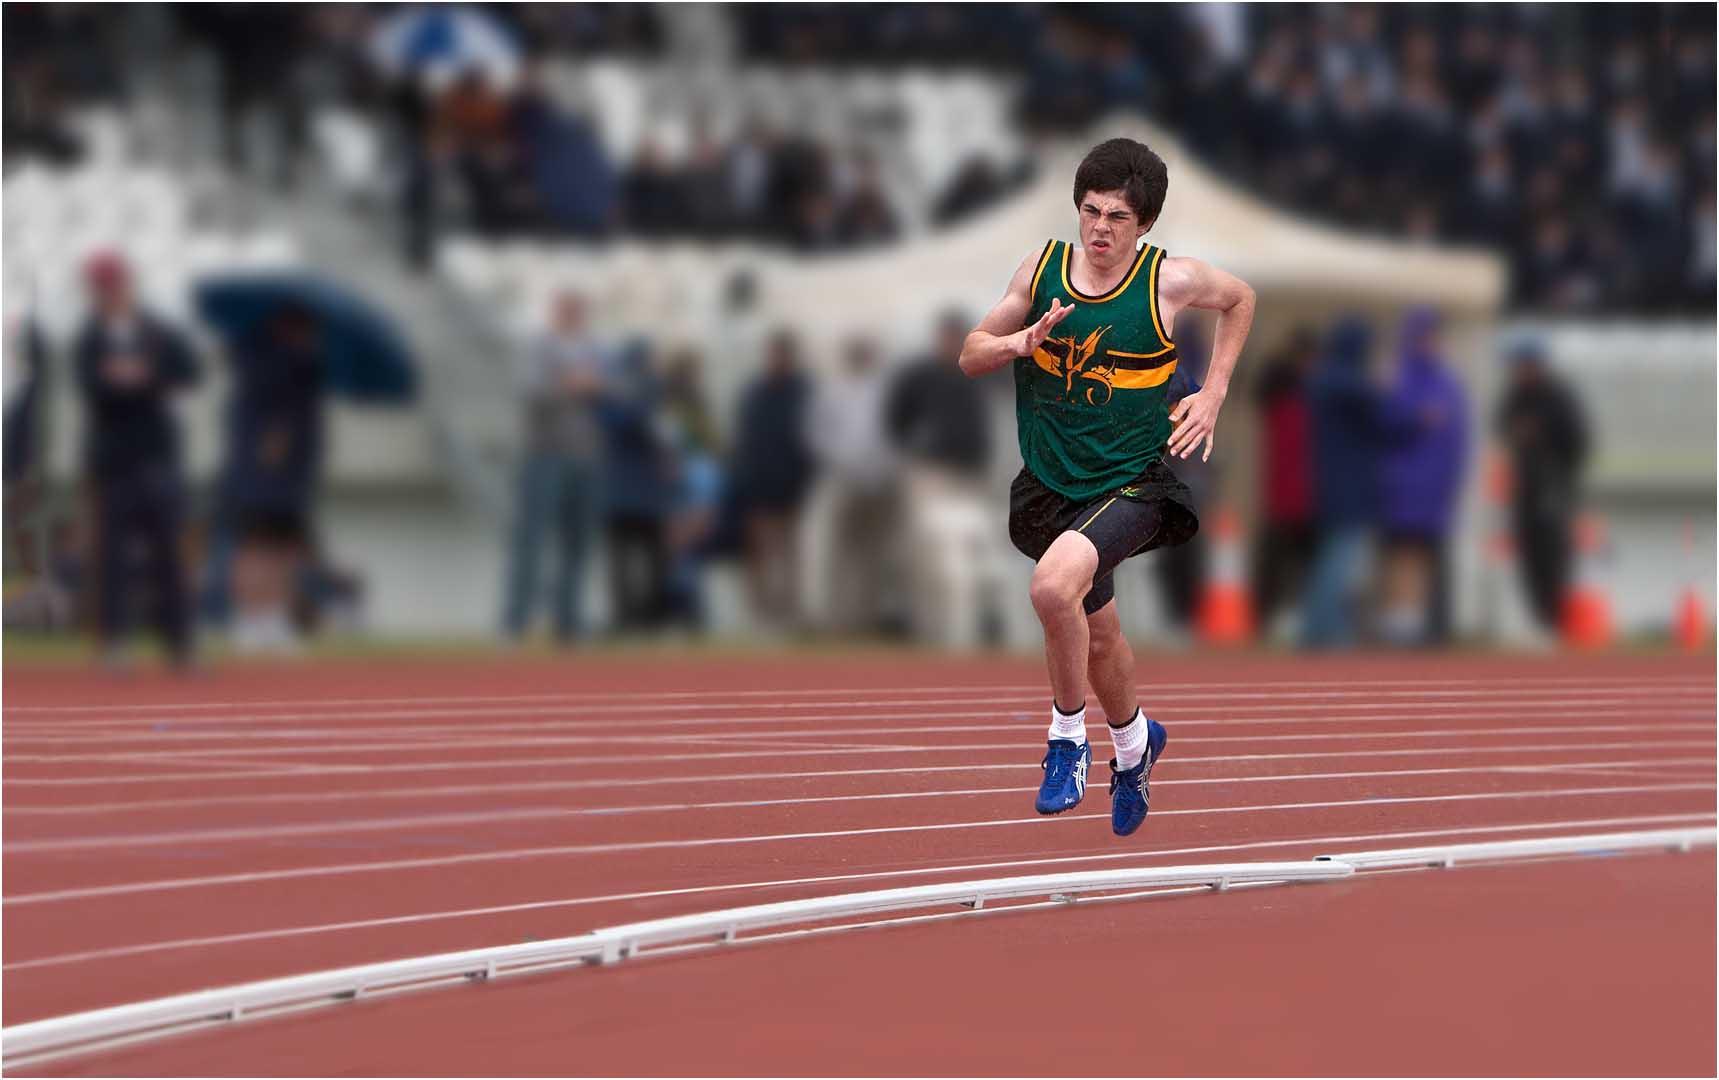 The Athletics Champ